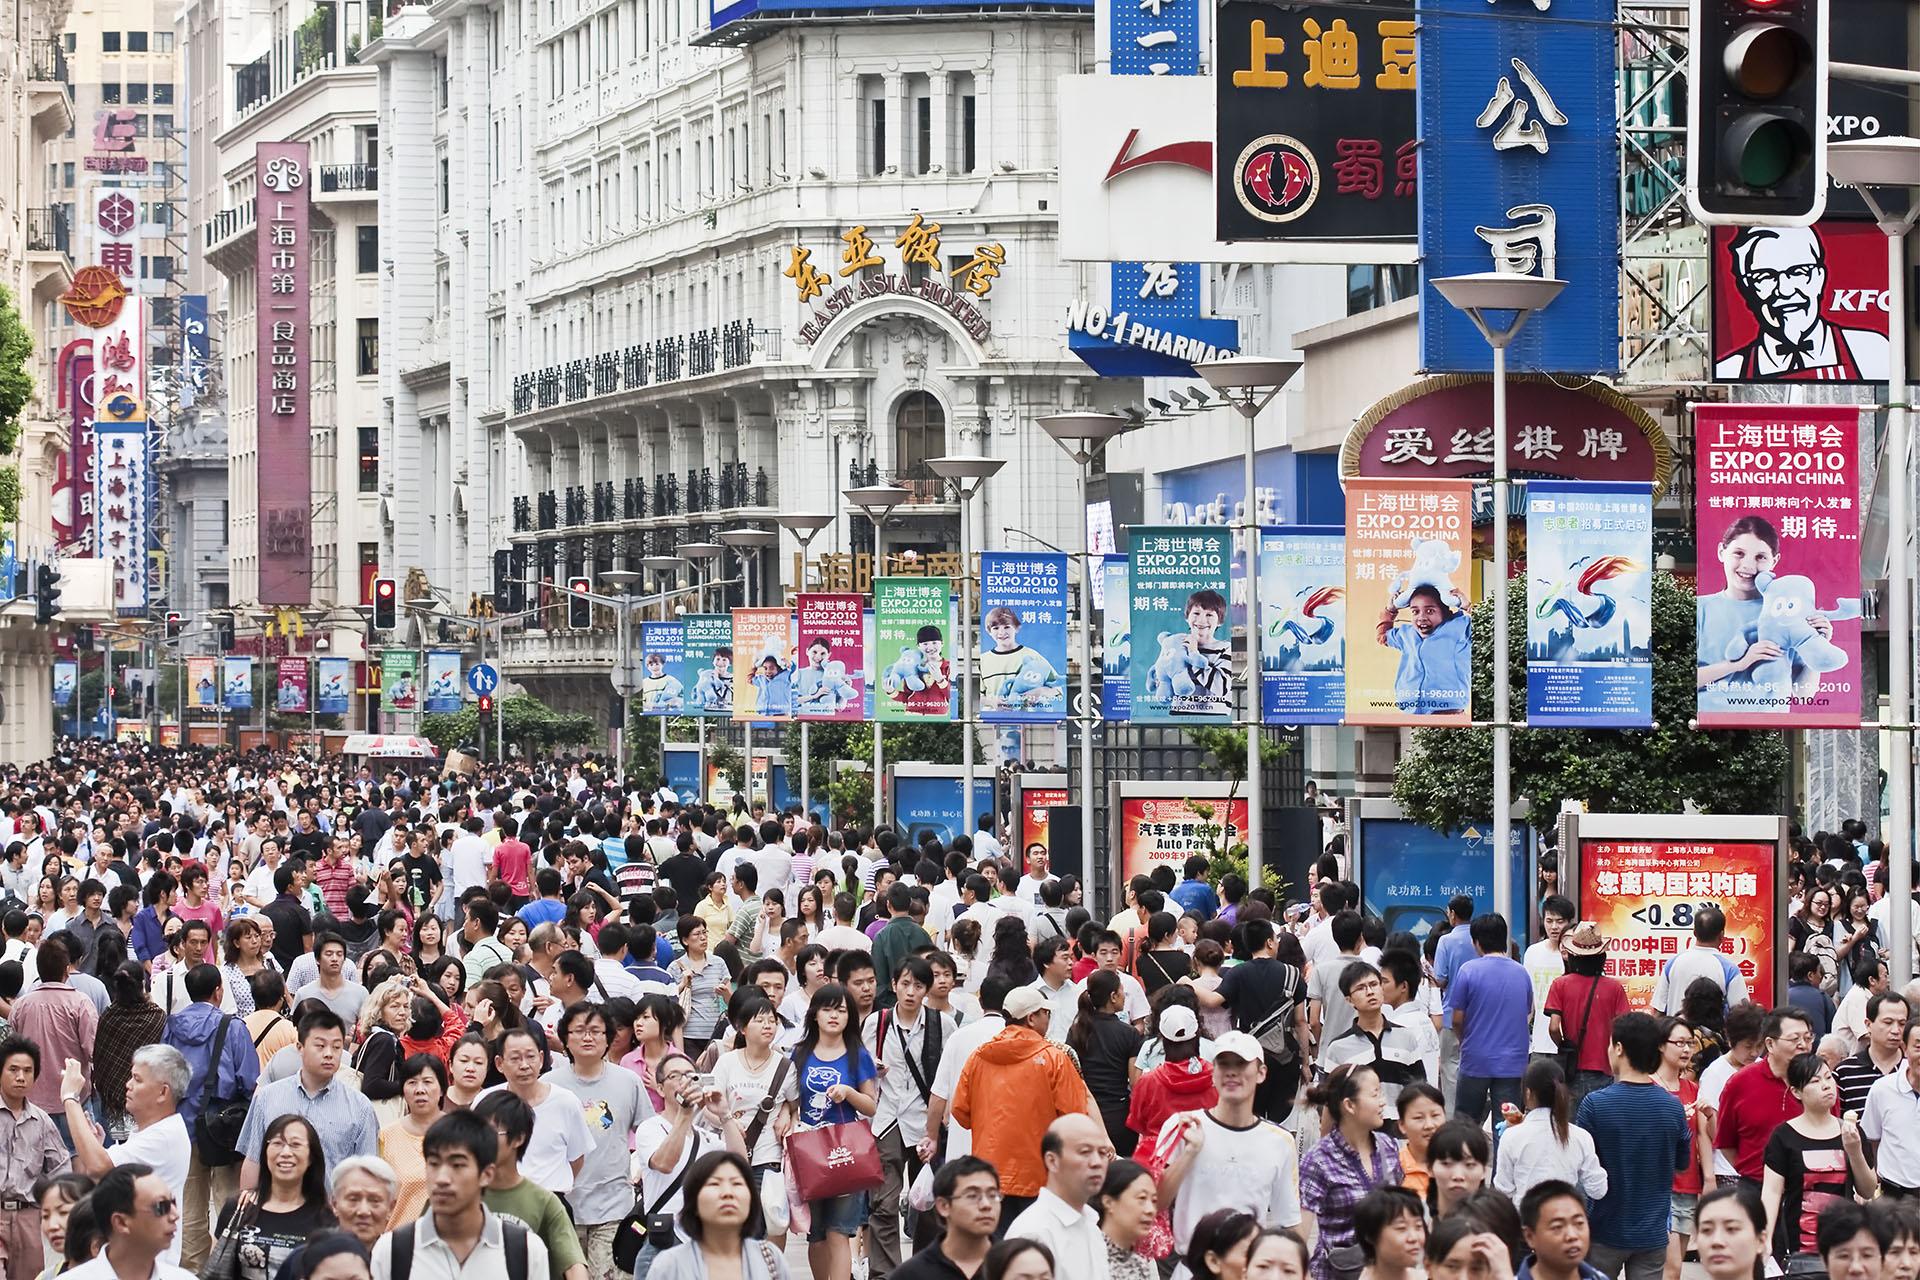 ANTES - Una postal de China antes del nuevo coronavirus (Shutterstock)